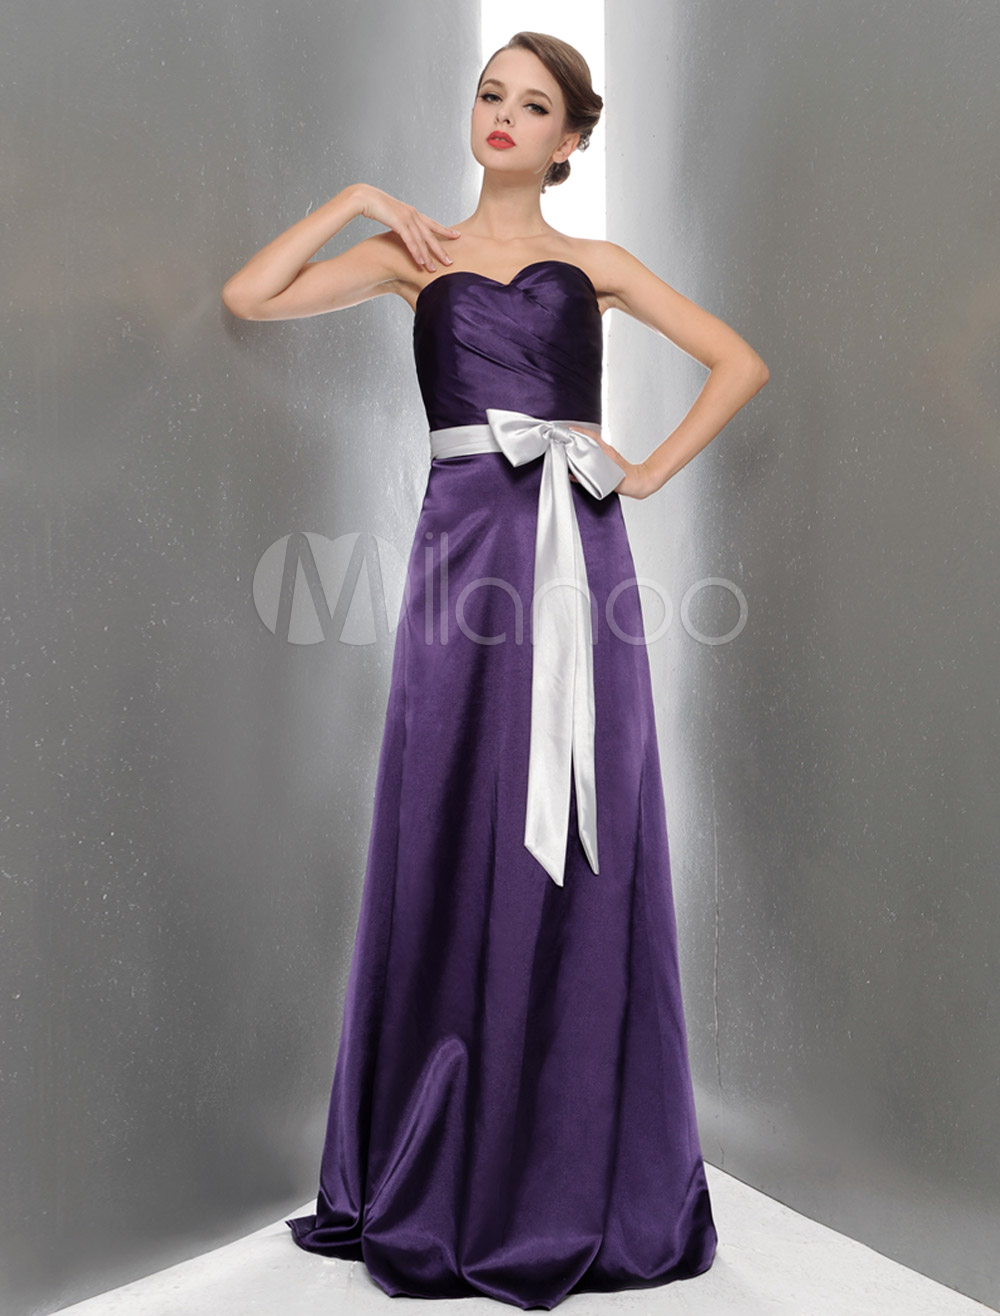 Vestido de damas de honor de satén elástico de violeta oscura ...